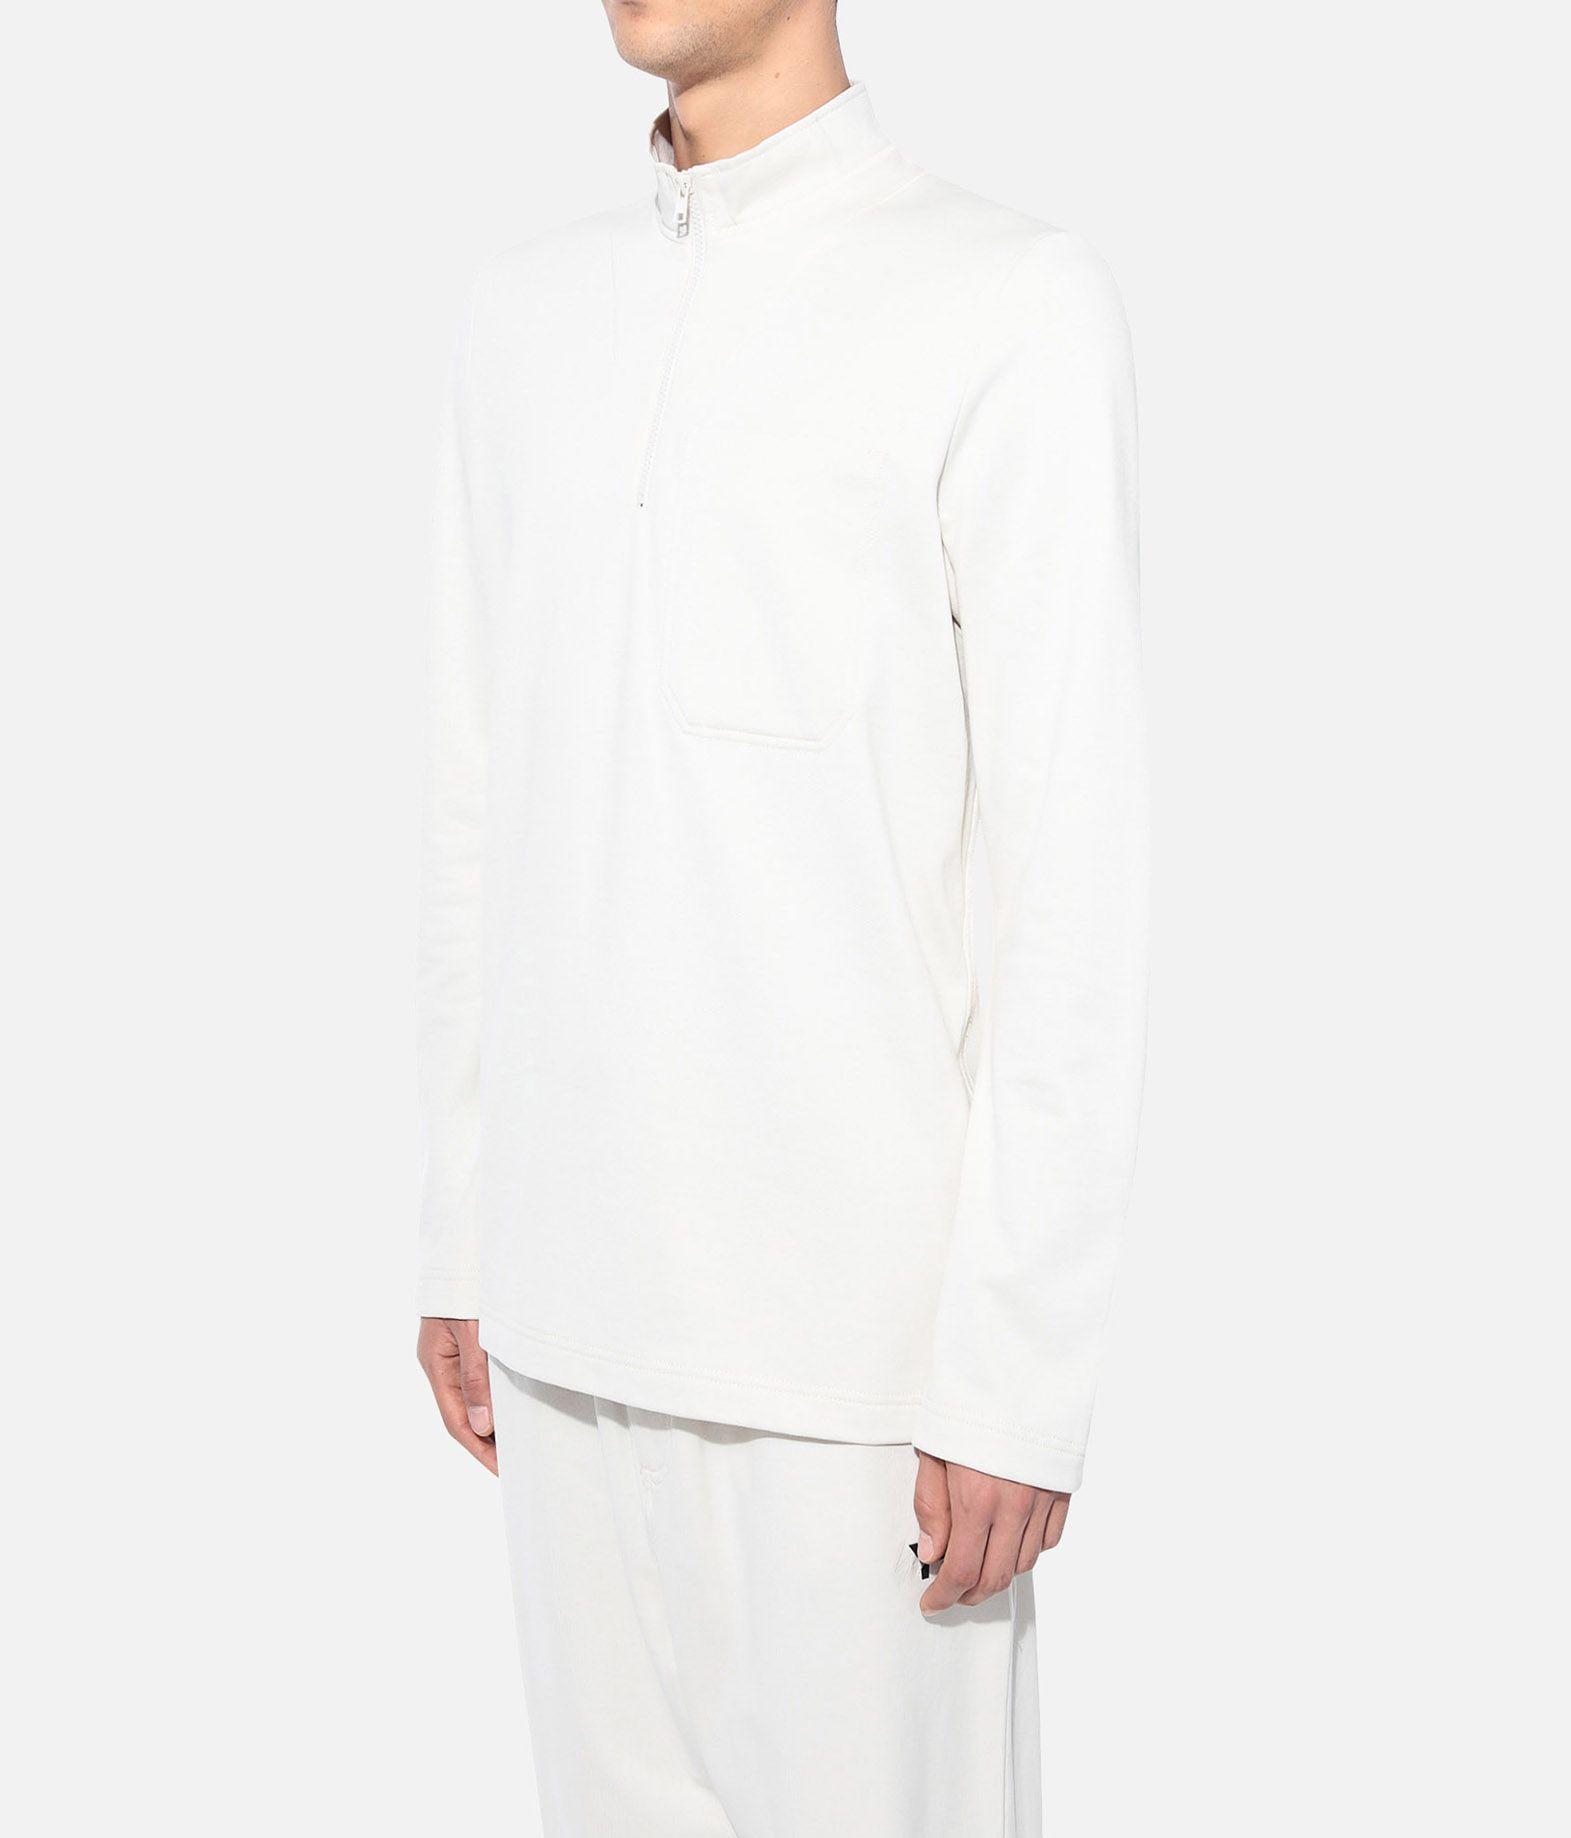 Y-3 Y-3 Sashiko Sweater Толстовка на молнии Для Мужчин e